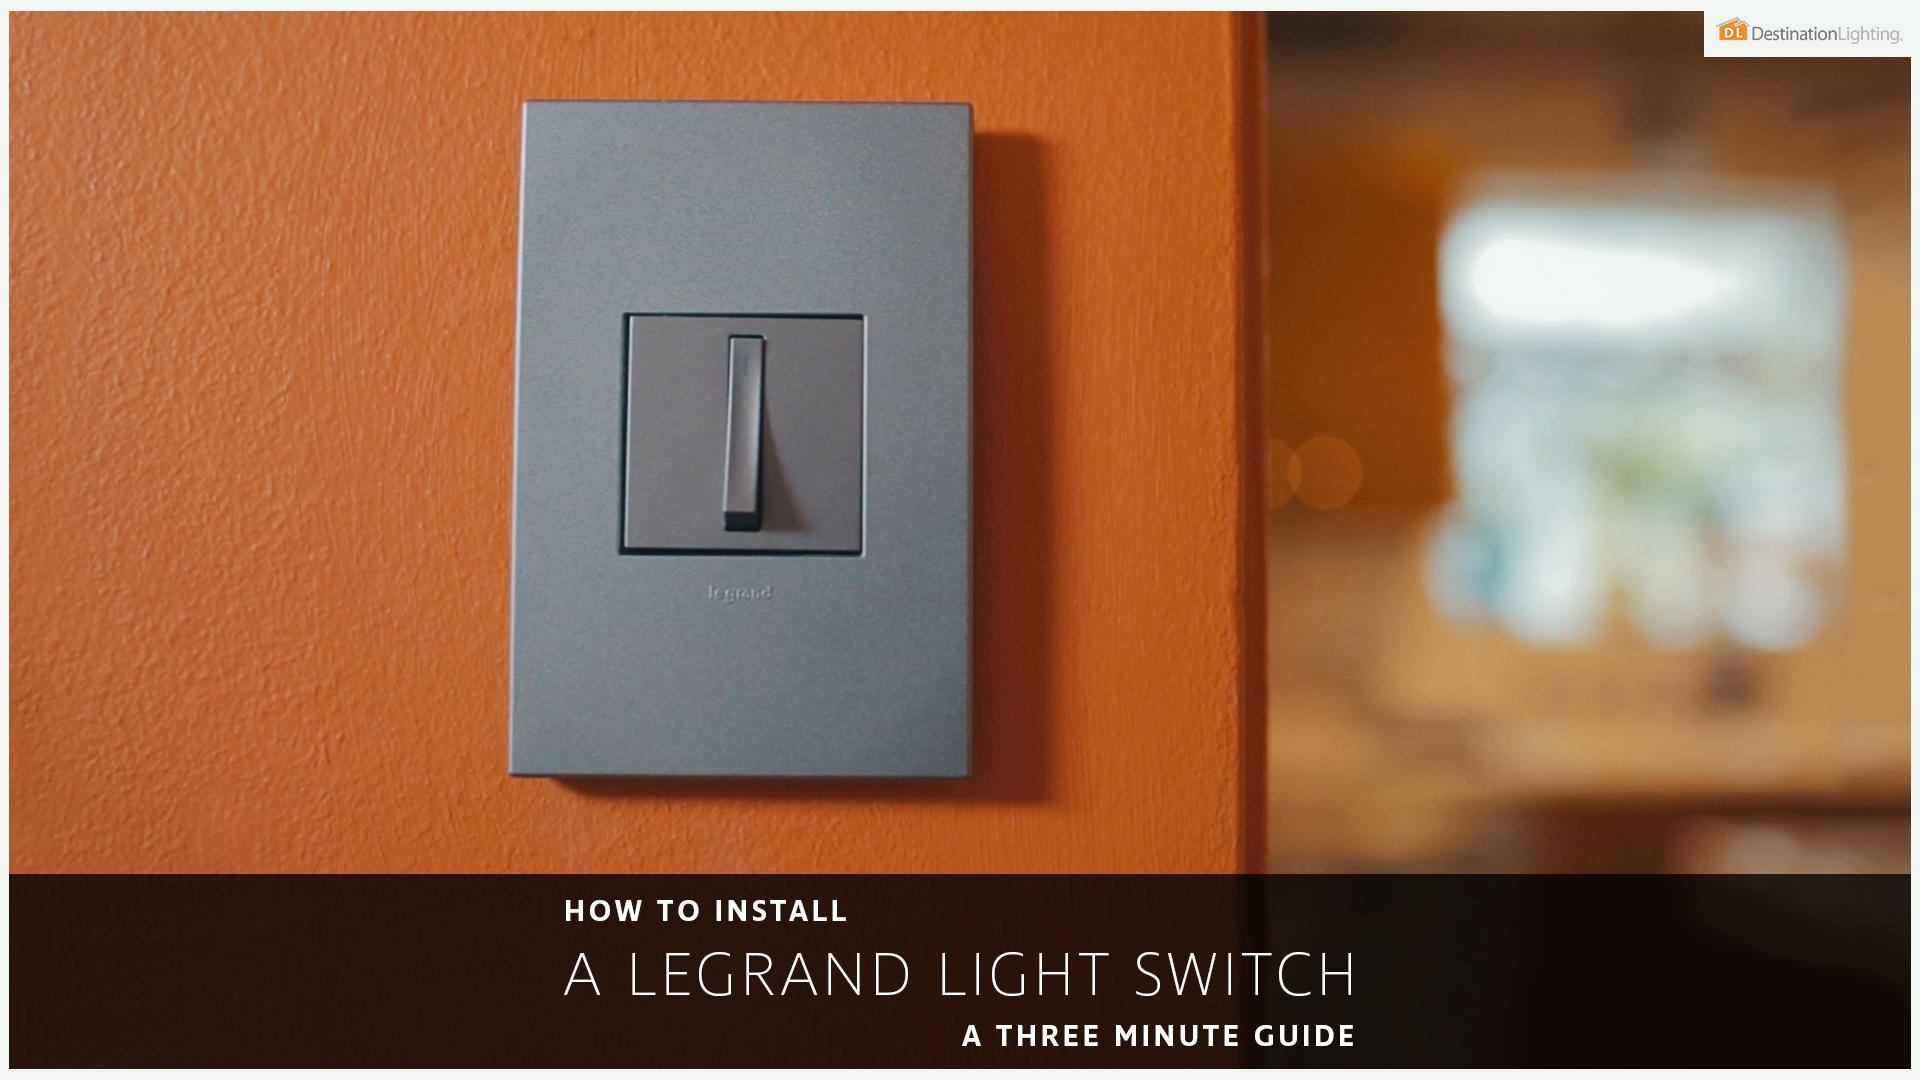 Spotlight Installing A Legrand Light Switch Flip The 2 Way